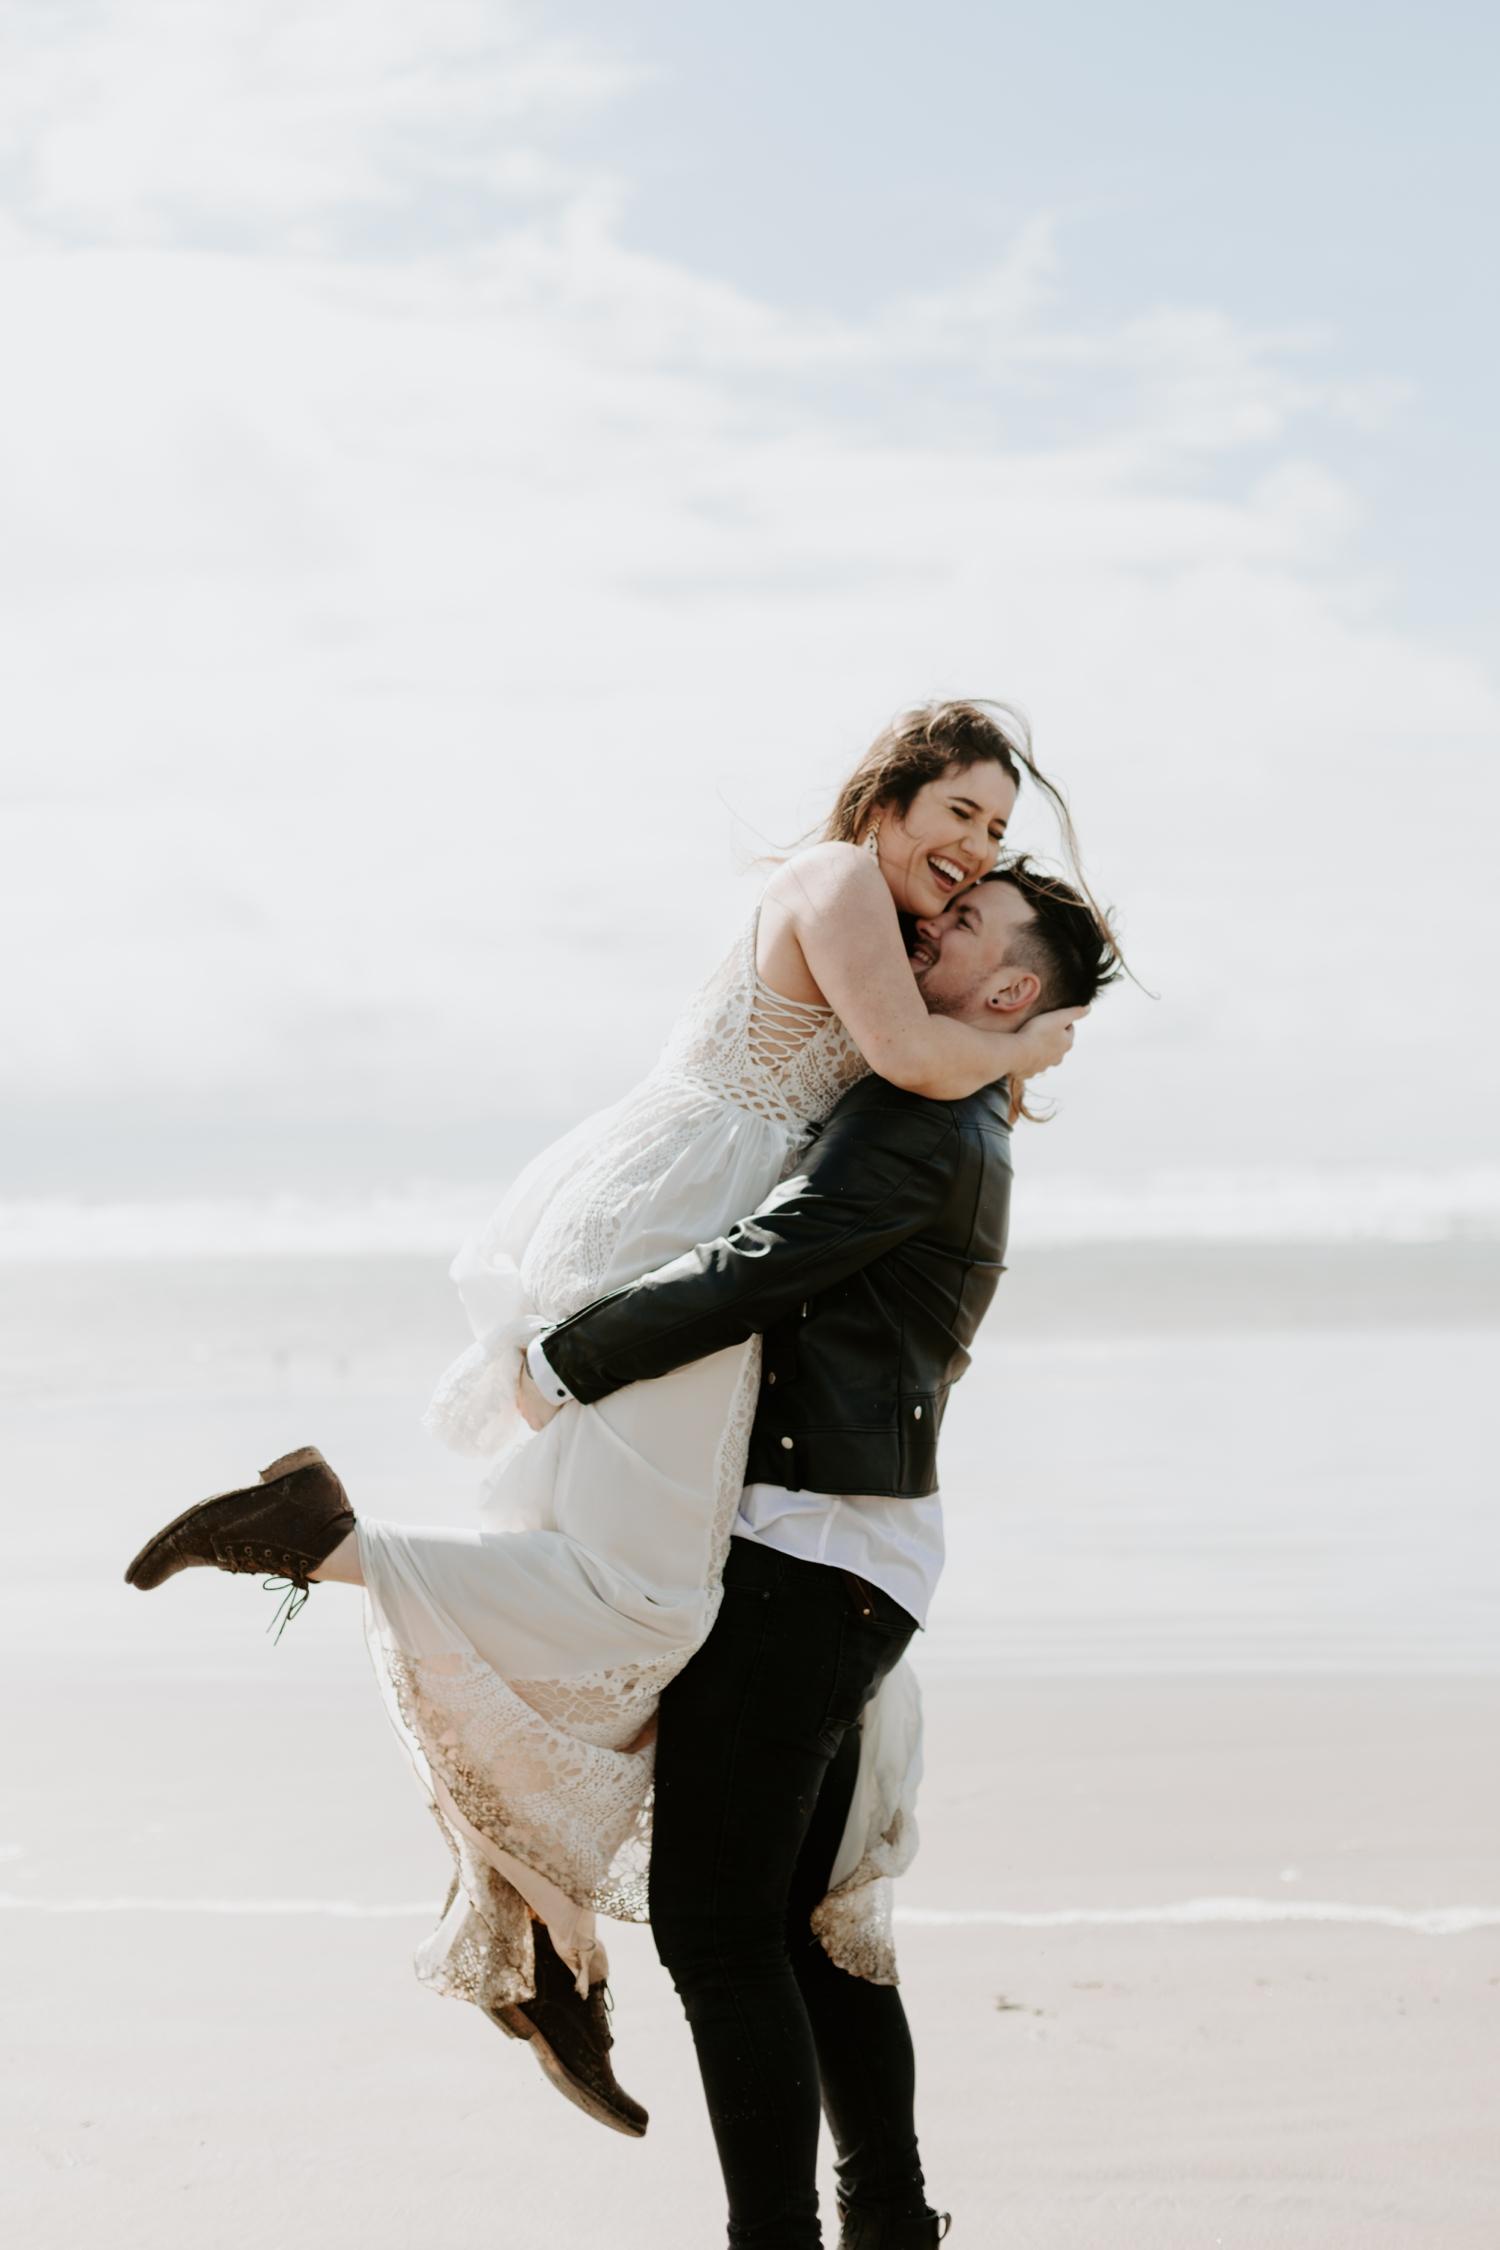 adventurous-cannon-beach-elopement-2018-04-26_0037.jpg